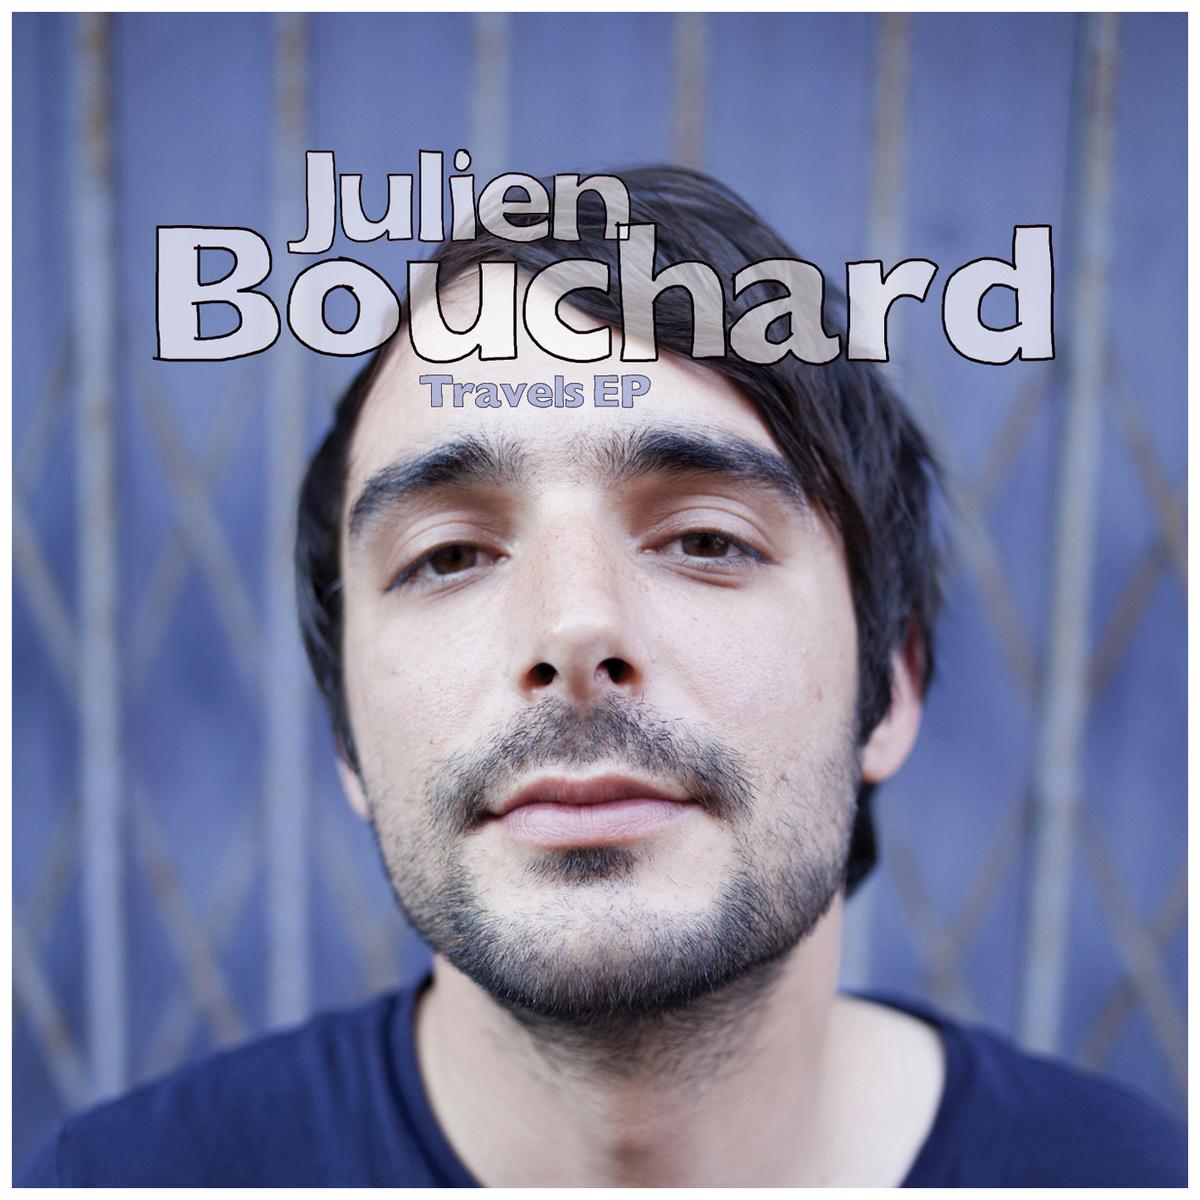 Julien Bouchard Travels Ep - Hot Puma Records